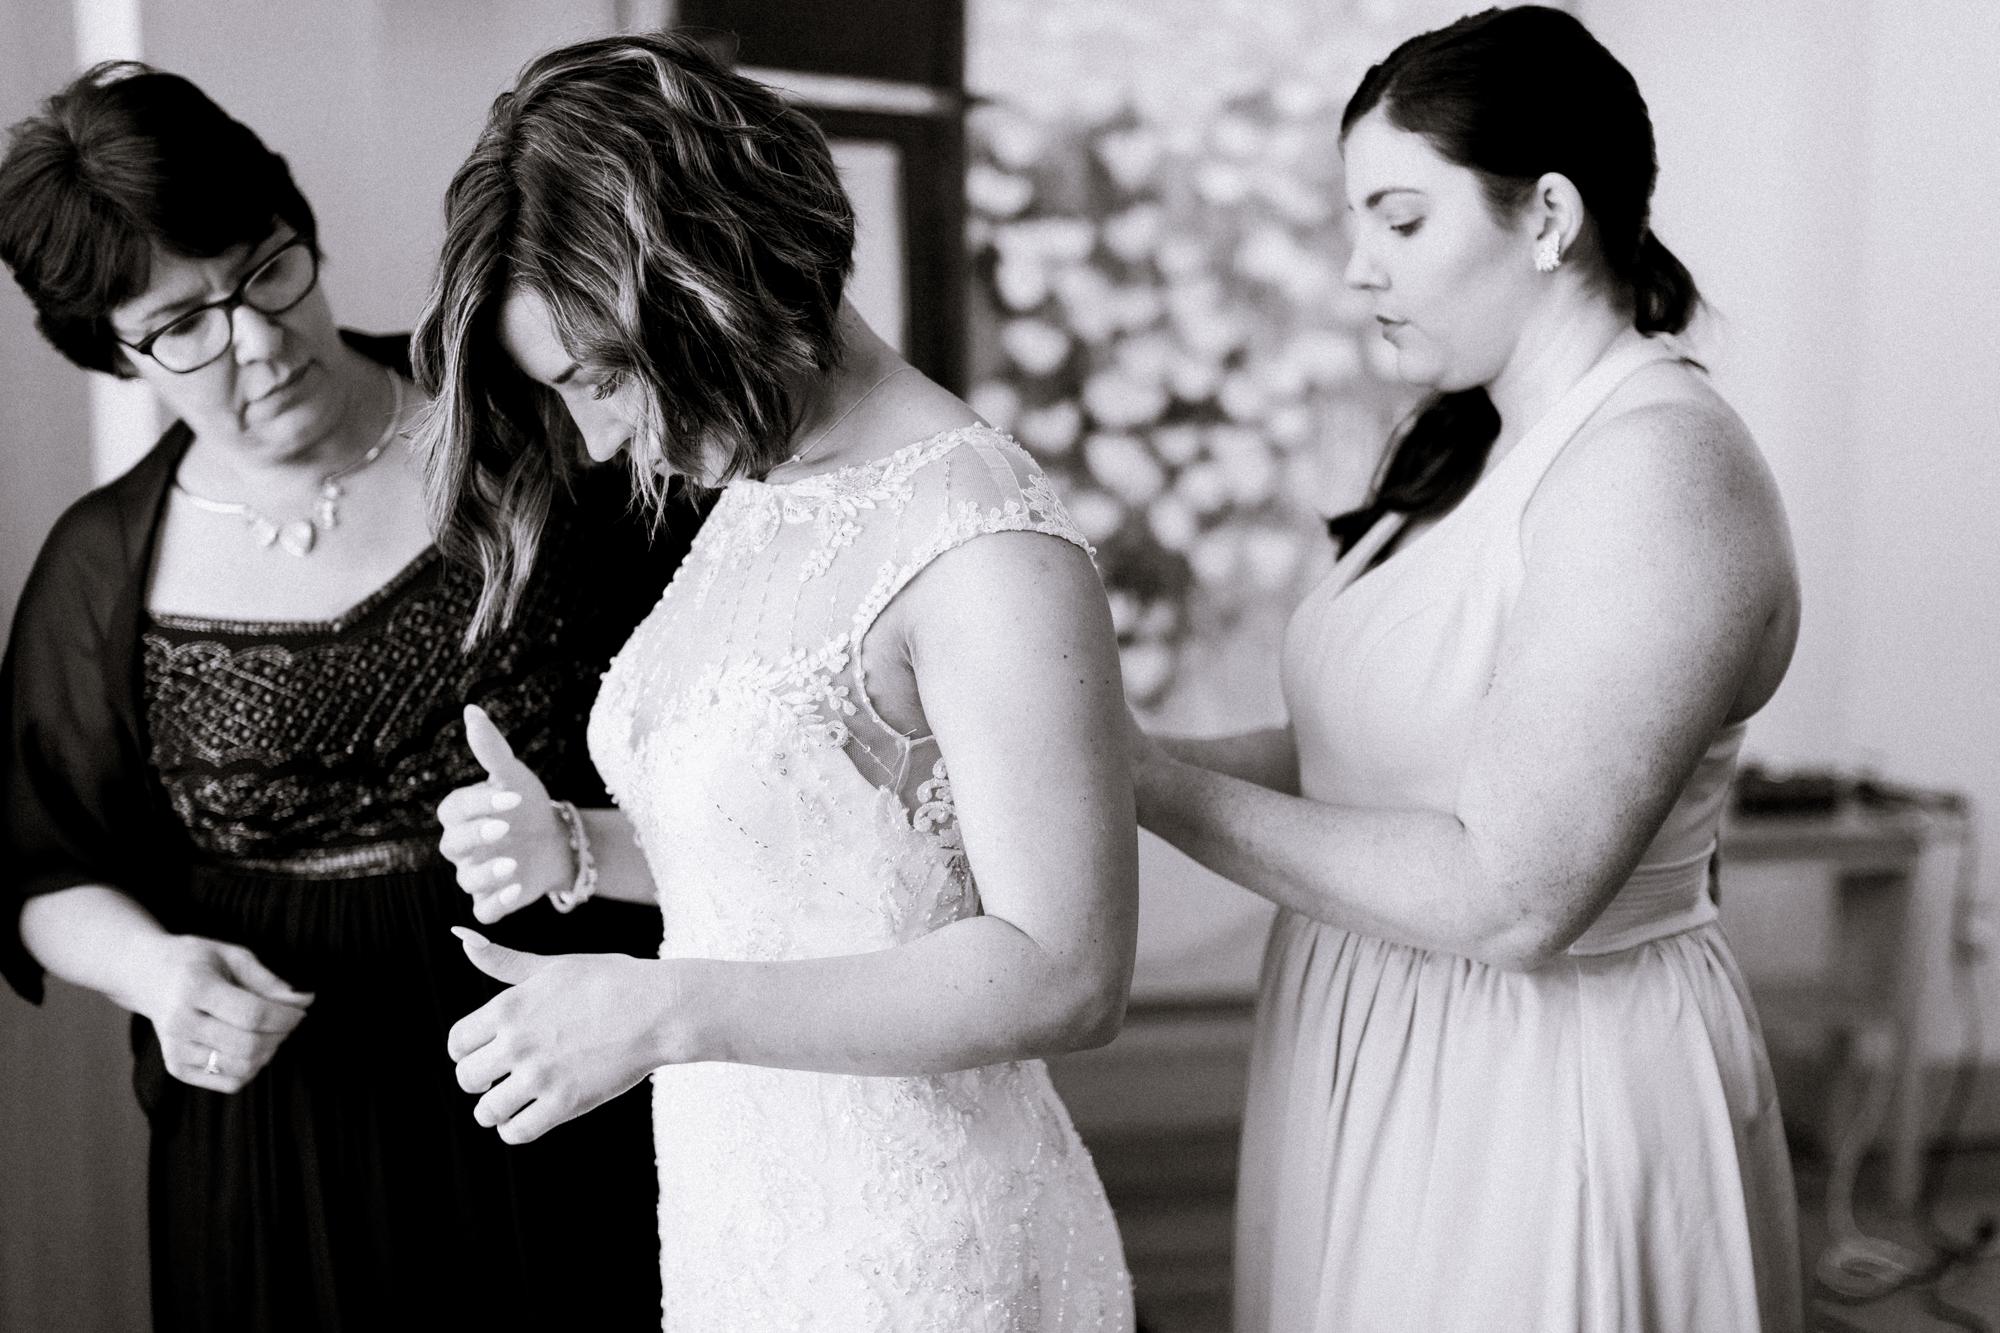 Garden party wedding at Lady Bird Johnson Wildflower Center // austin, texas wedding photographer // www.abbihearne.com